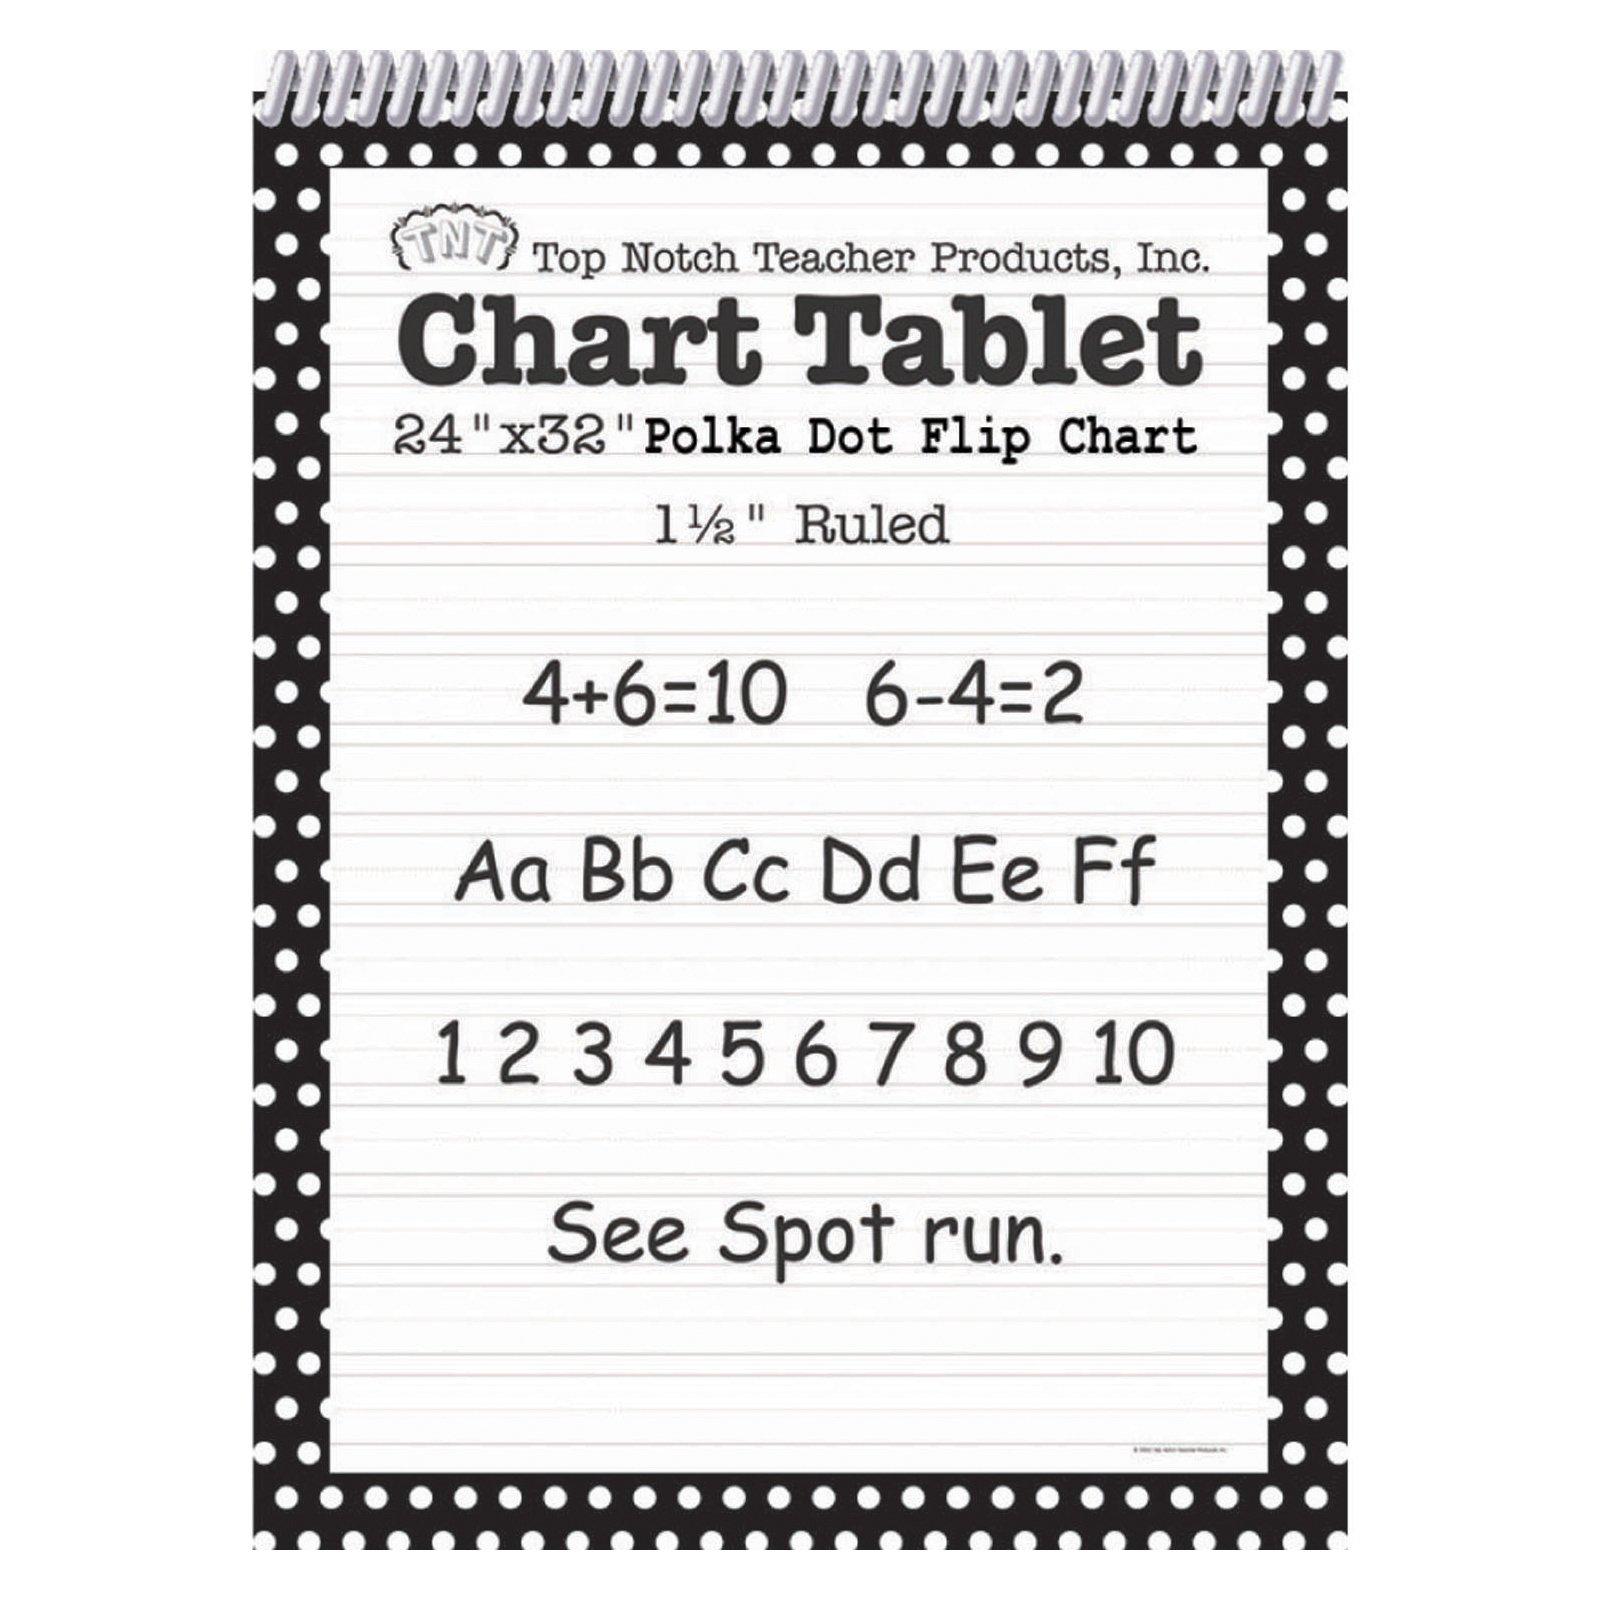 Top Notch Teacher Products Chart Tablet Polka Dot (1 1/2'' Ruled), Black, 24'' x 32'' by Top Notch Teacher Products